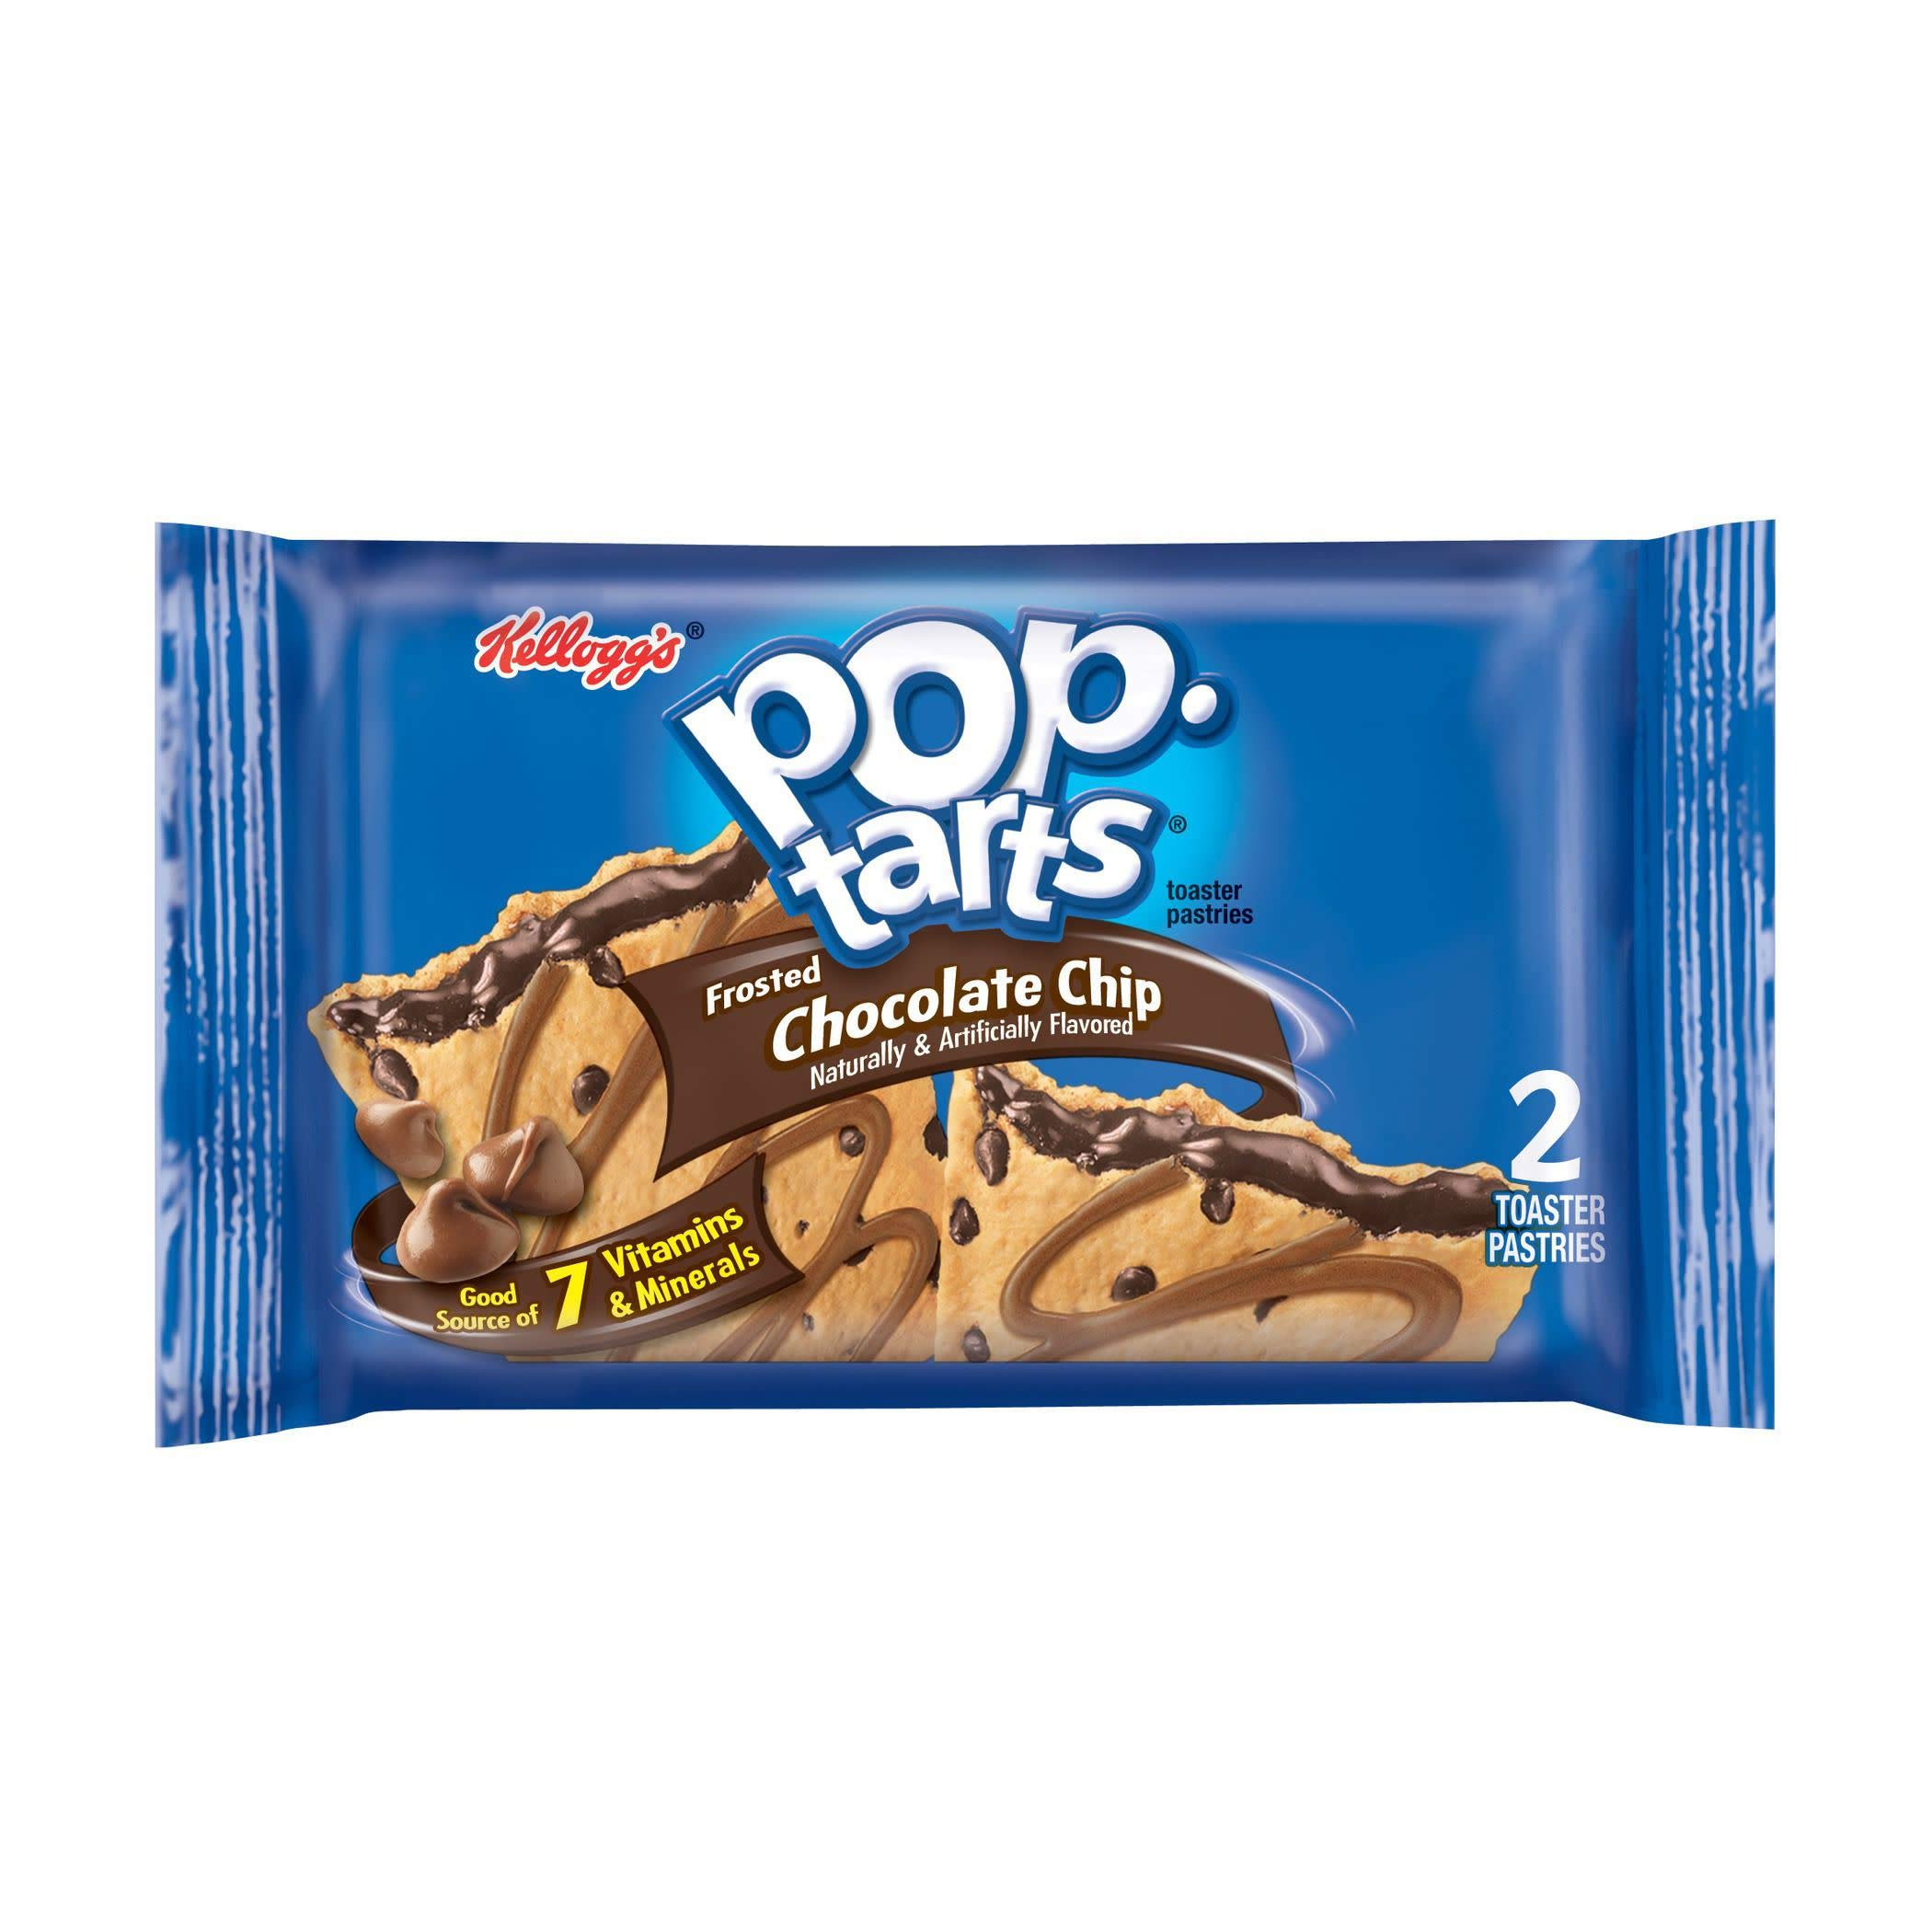 Kellogg's Pop-Tarts, Chocolate Chip, 3.67 Ounce (Pack of 72)